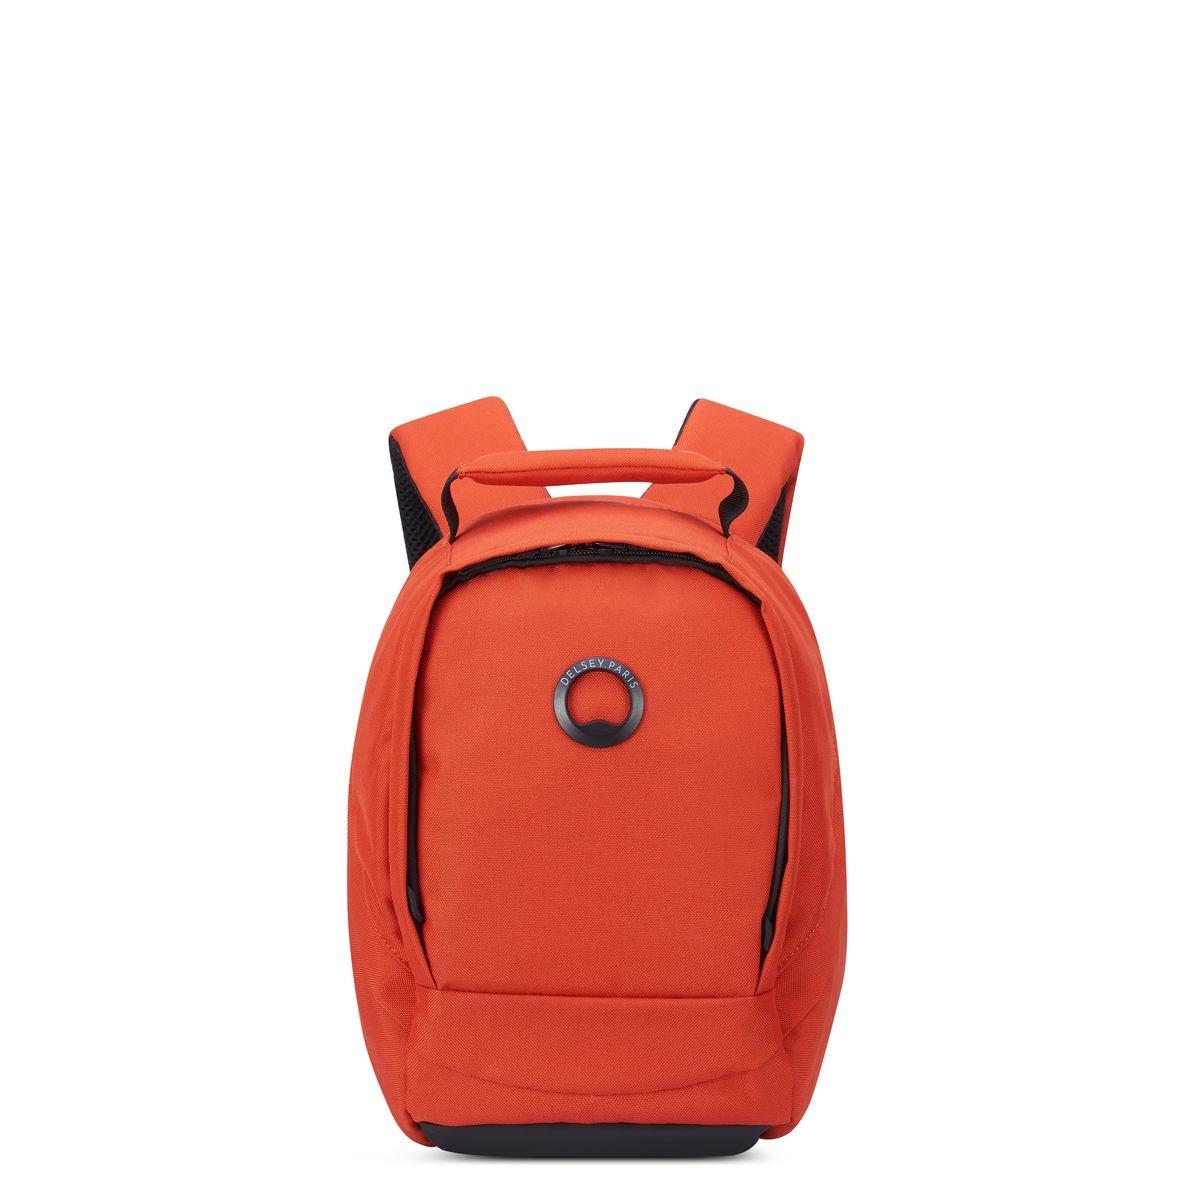 Delsey σακίδιο πλάτης 30.5x21.5x14.5cm Securban Micro Orange